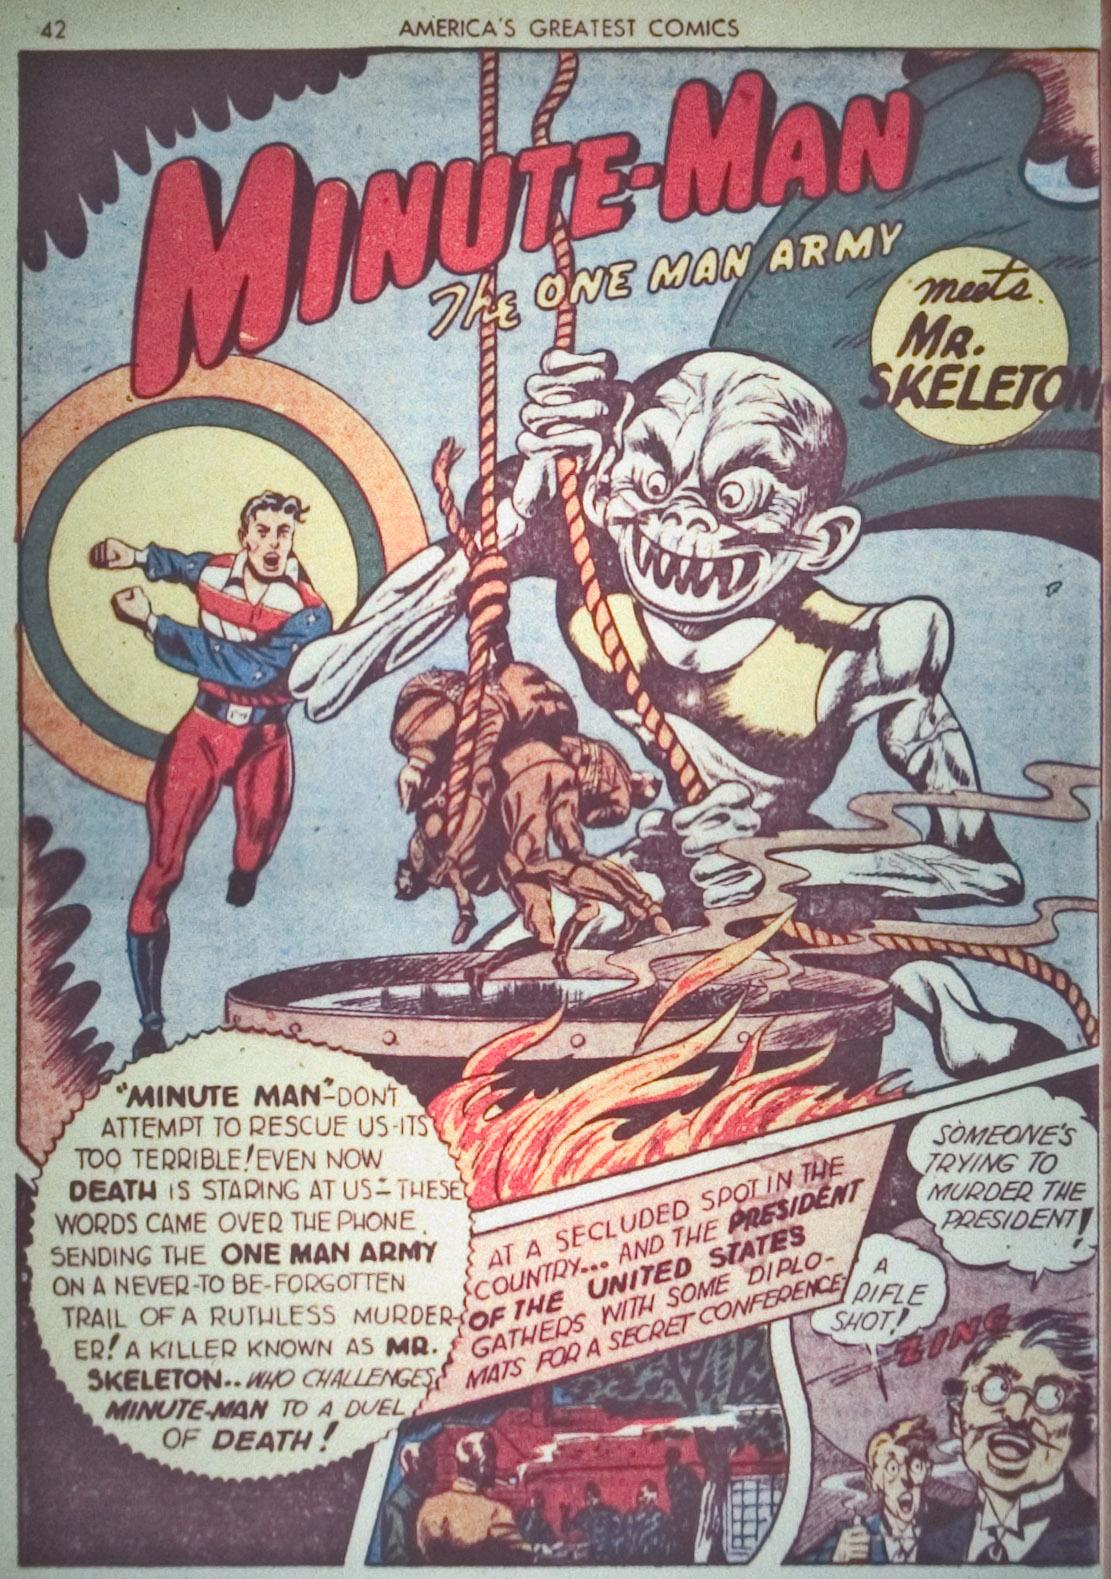 Read online America's Greatest Comics comic -  Issue #1 - 45